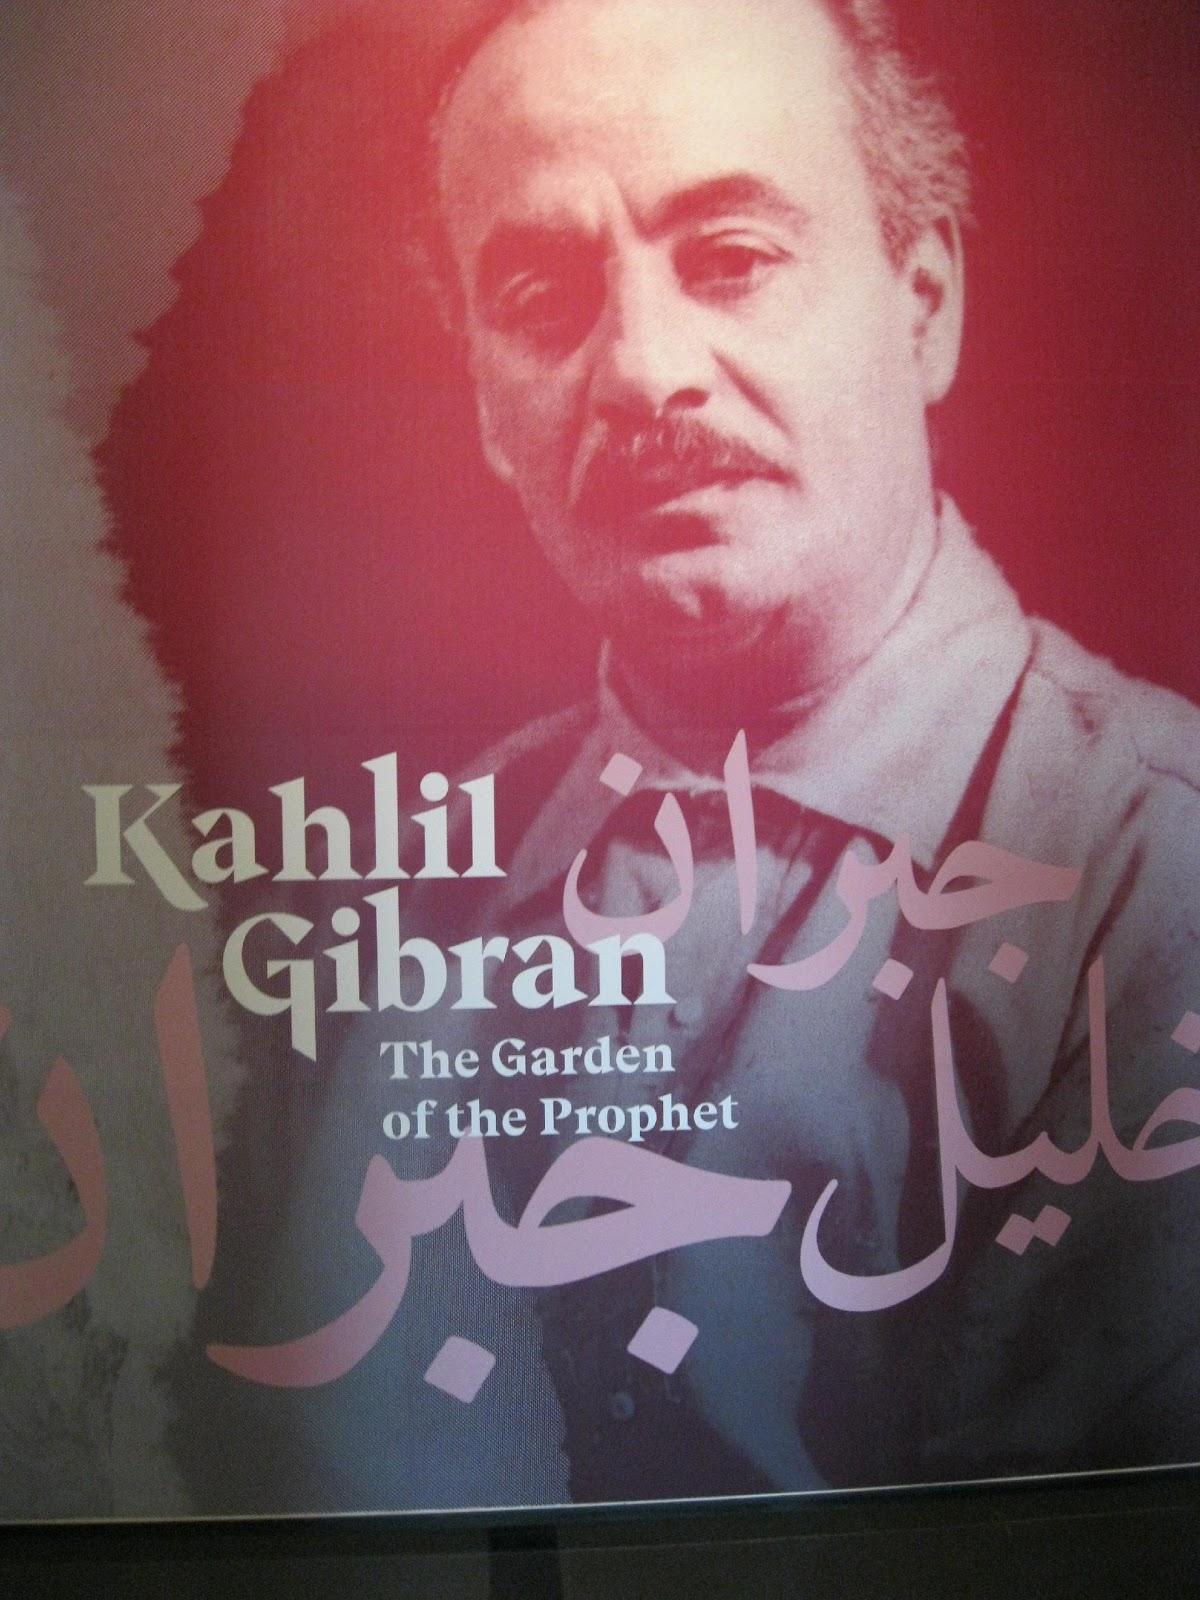 Kahlil Gibran: The Garden of the Prophet Exhibition